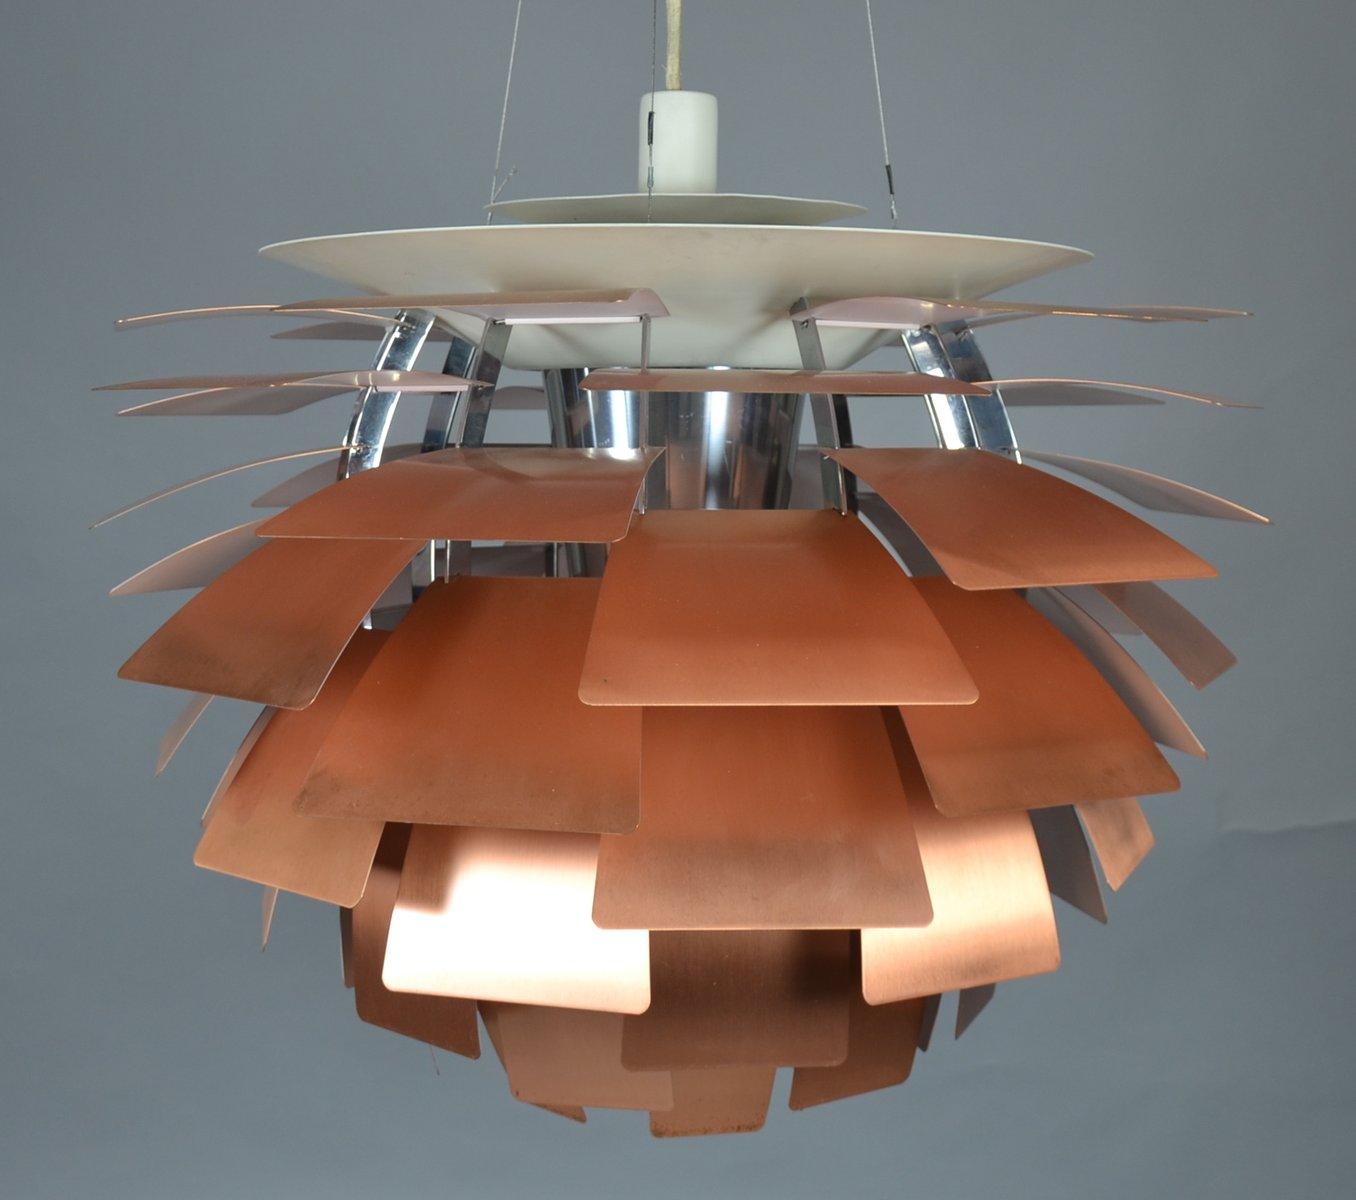 Ph Artichoke Lampe Aus Kupfer Von Poul Henningsen Fur Louis Poulsen